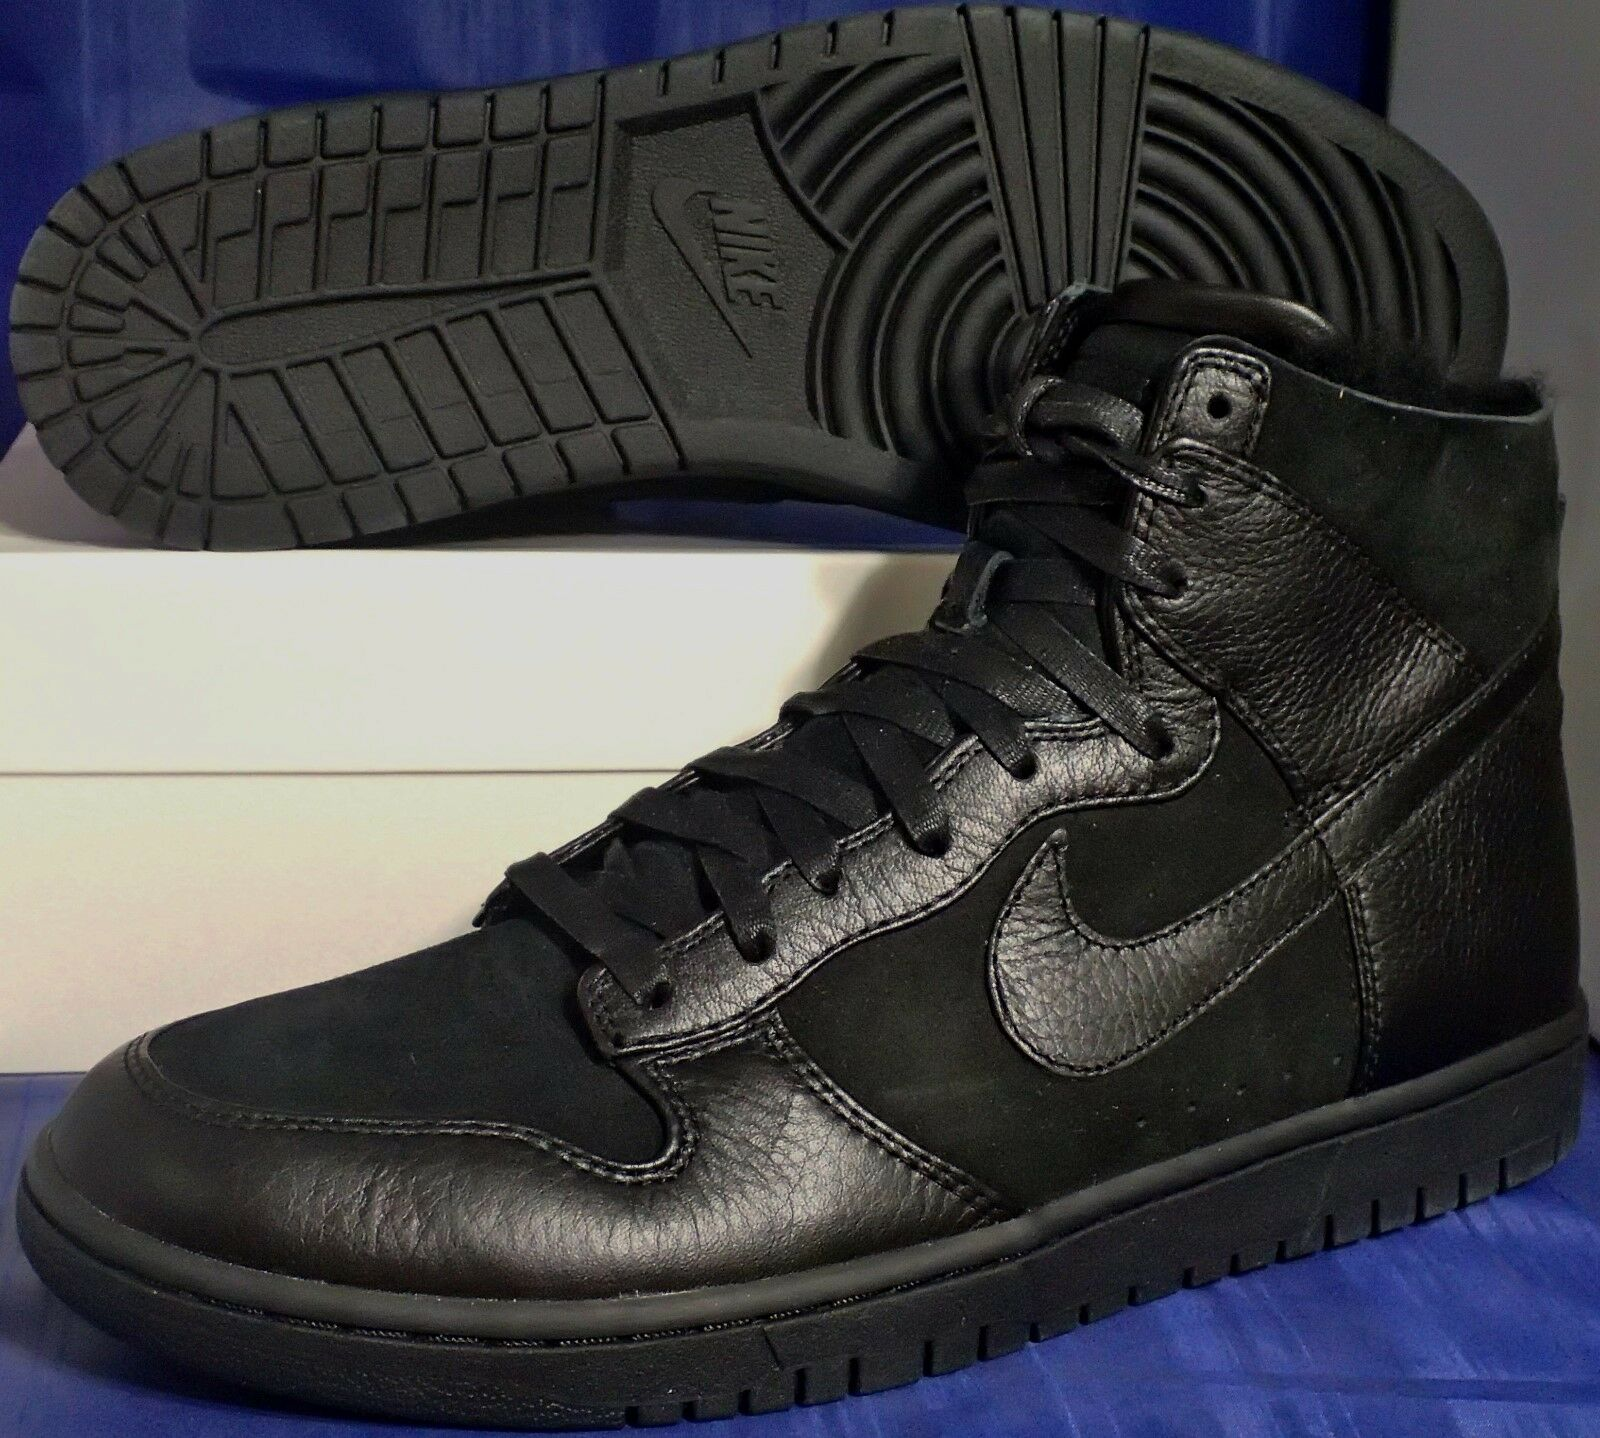 Nike e nero lux sp sherpa nero e nikelab sz 12 (744301-001) e66c82